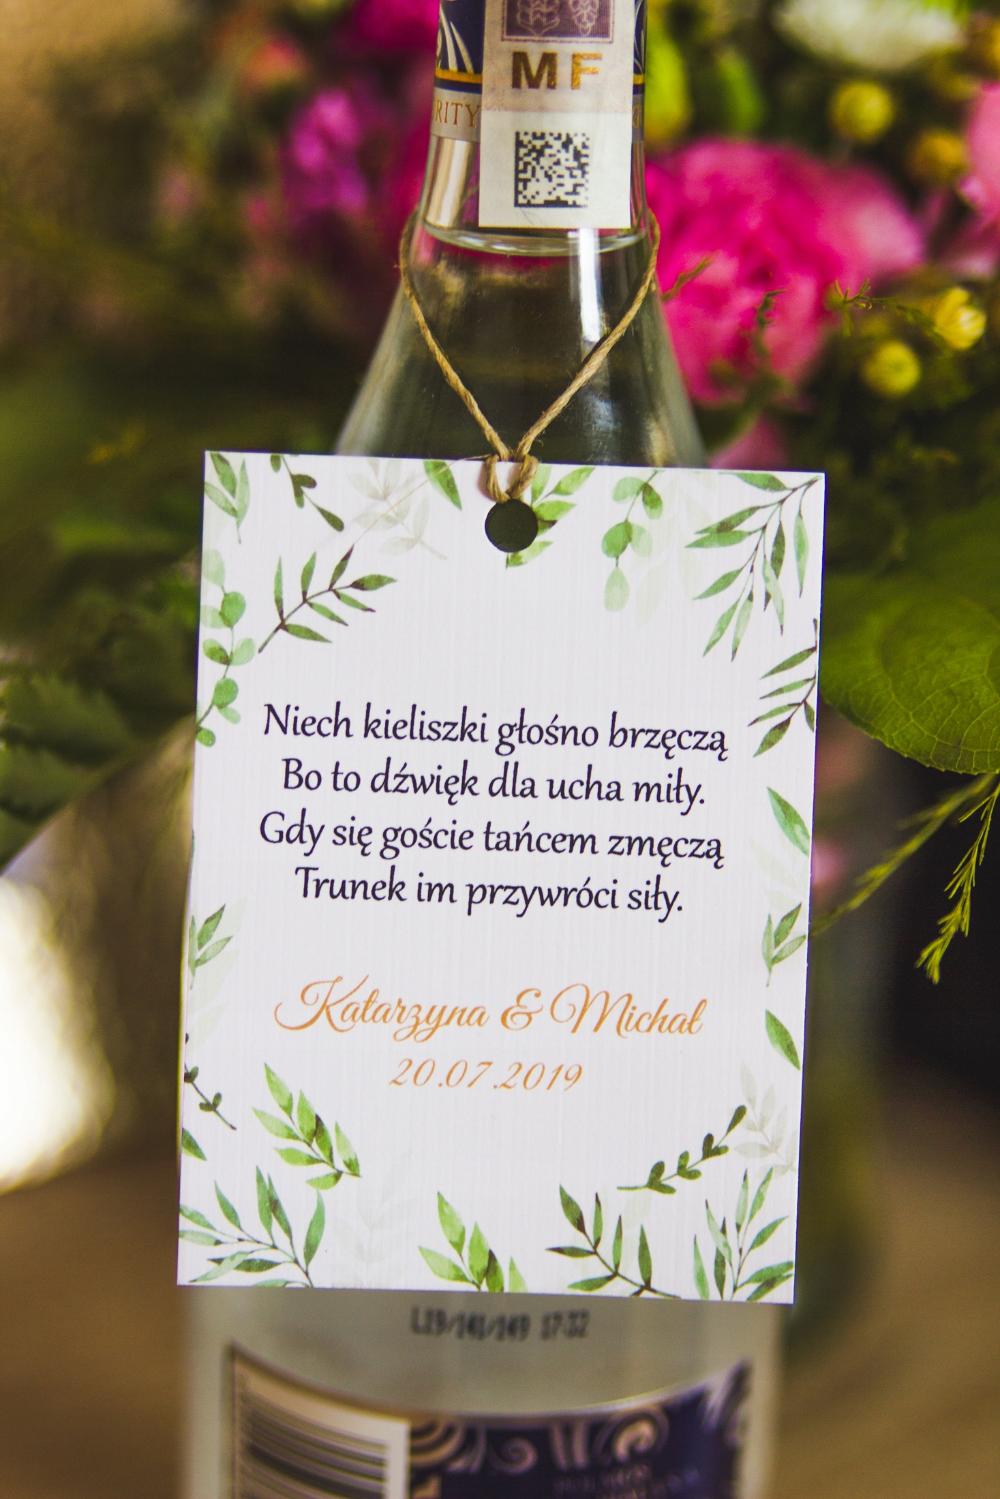 Kup Teraz Na Allegro Pl Za 3 80 Zl Zawieszki Weselne Na Alkohol Lesne Liscie 10szt 8354859590 Allegro Pl Rado Wedding Decorations Wedding Day Wedding